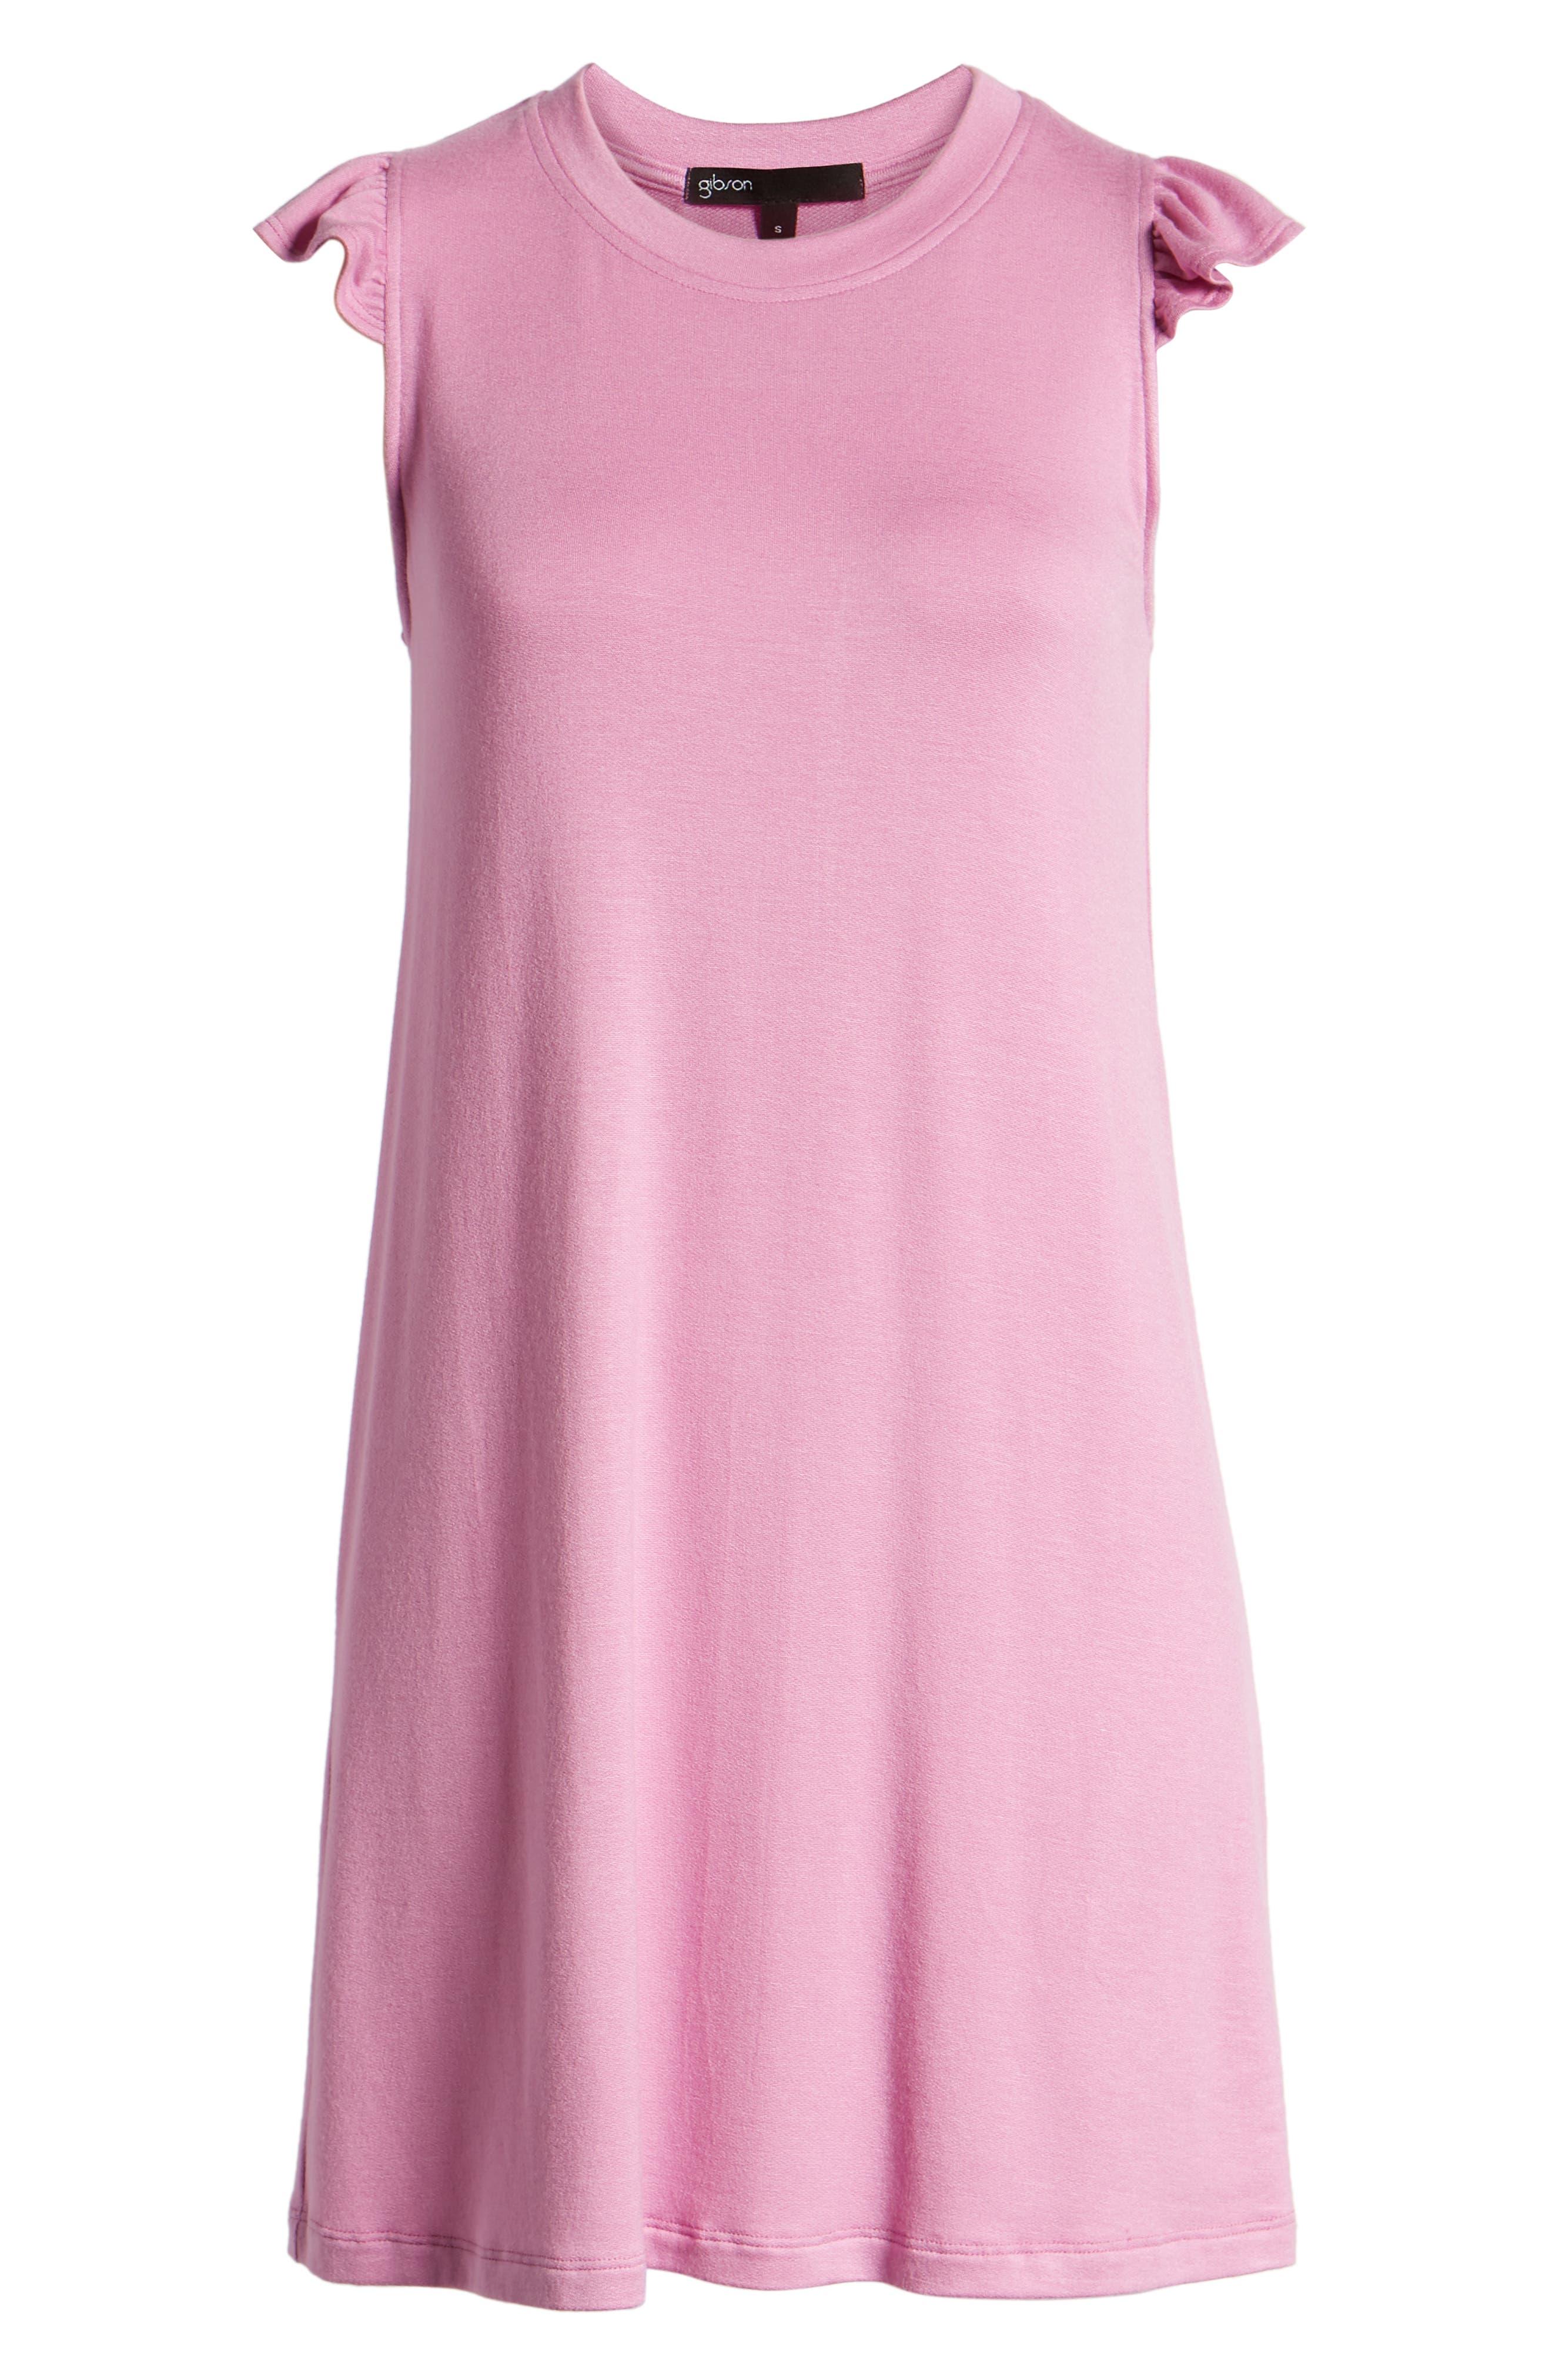 x Hi Sugarplum! Laguna Soft Jersey Ruffle Back T-Shirt Dress,                             Alternate thumbnail 7, color,                             PEONY